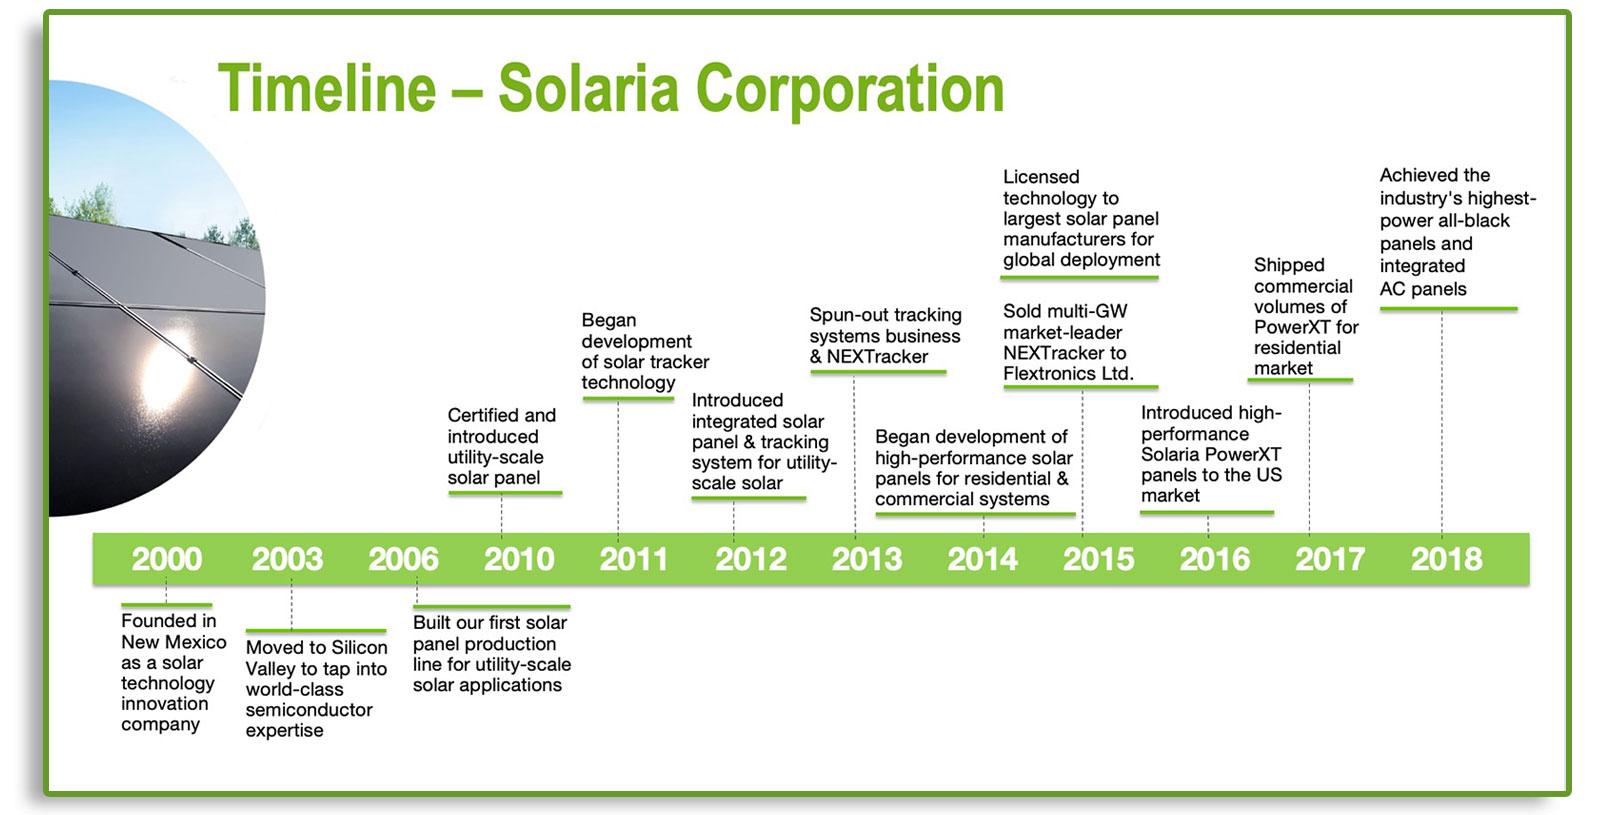 solariaTimeline-3.jpg